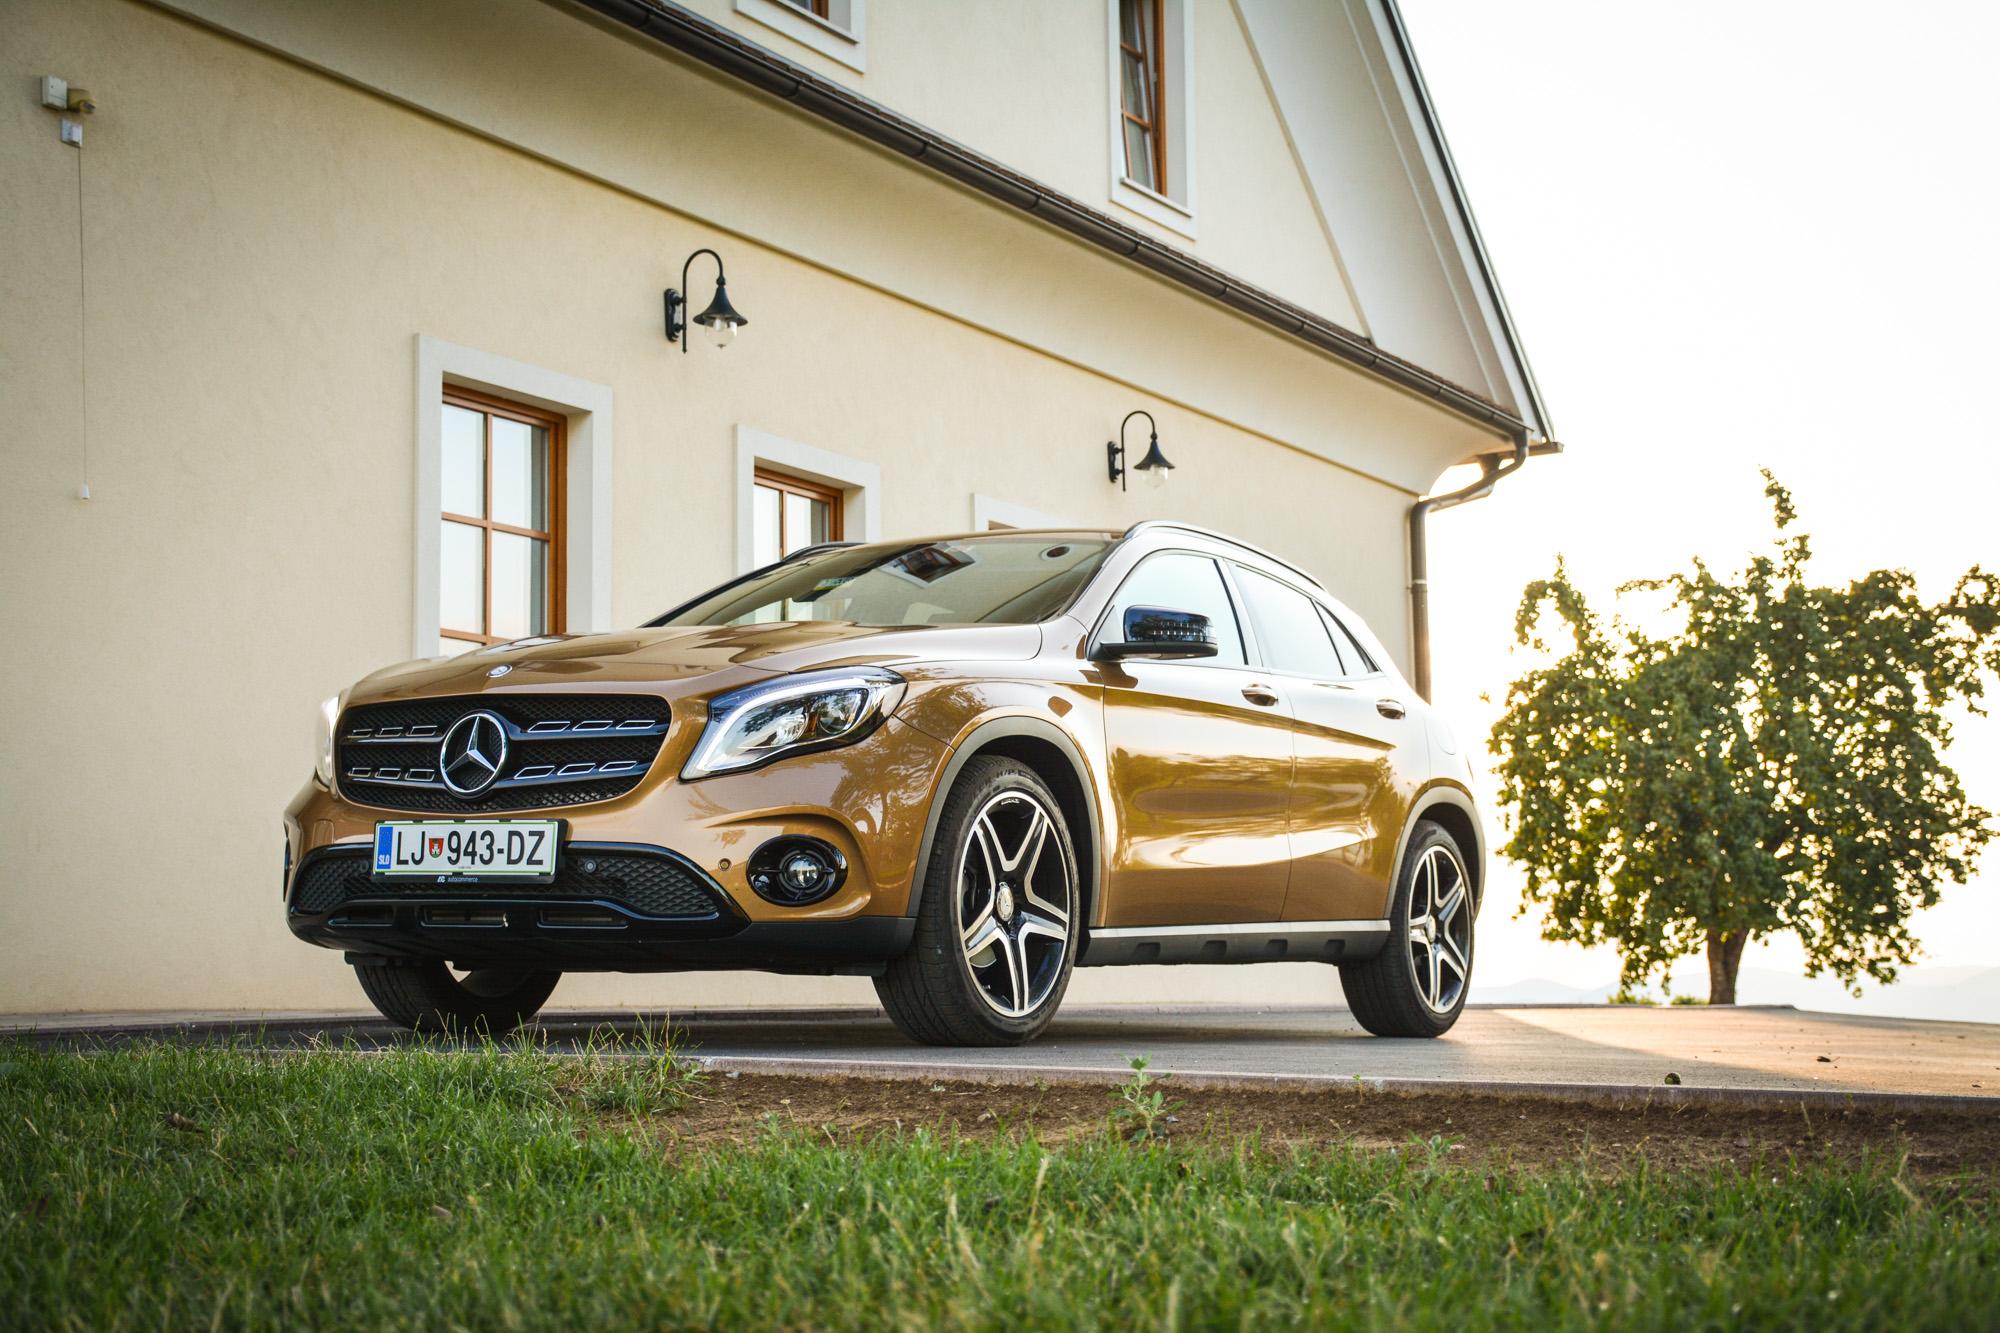 Test: Mercedes-Benz GLA 220 d 4MATIC (zvrhana mera zabave v vožnji)